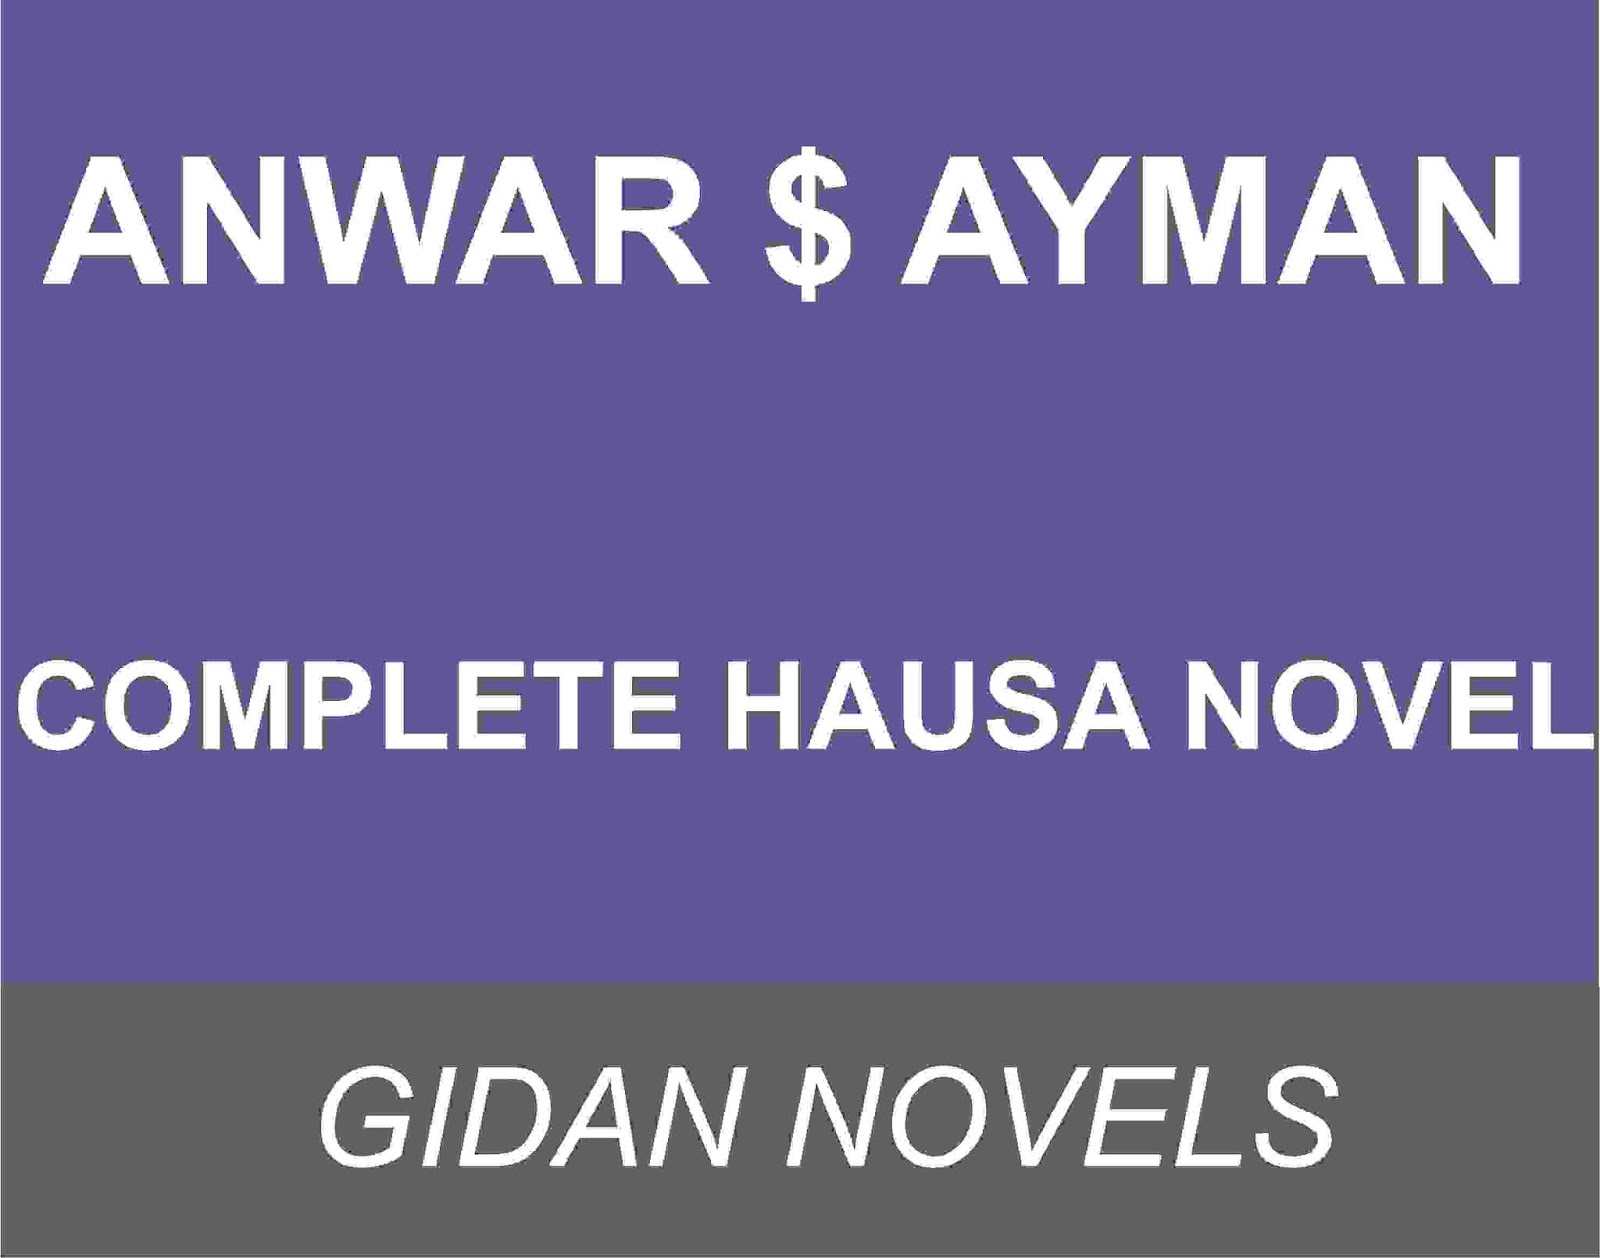 ANWAR $ AYMAN COMPLETE HAUSA NOVES WORLD - Gidan Novels